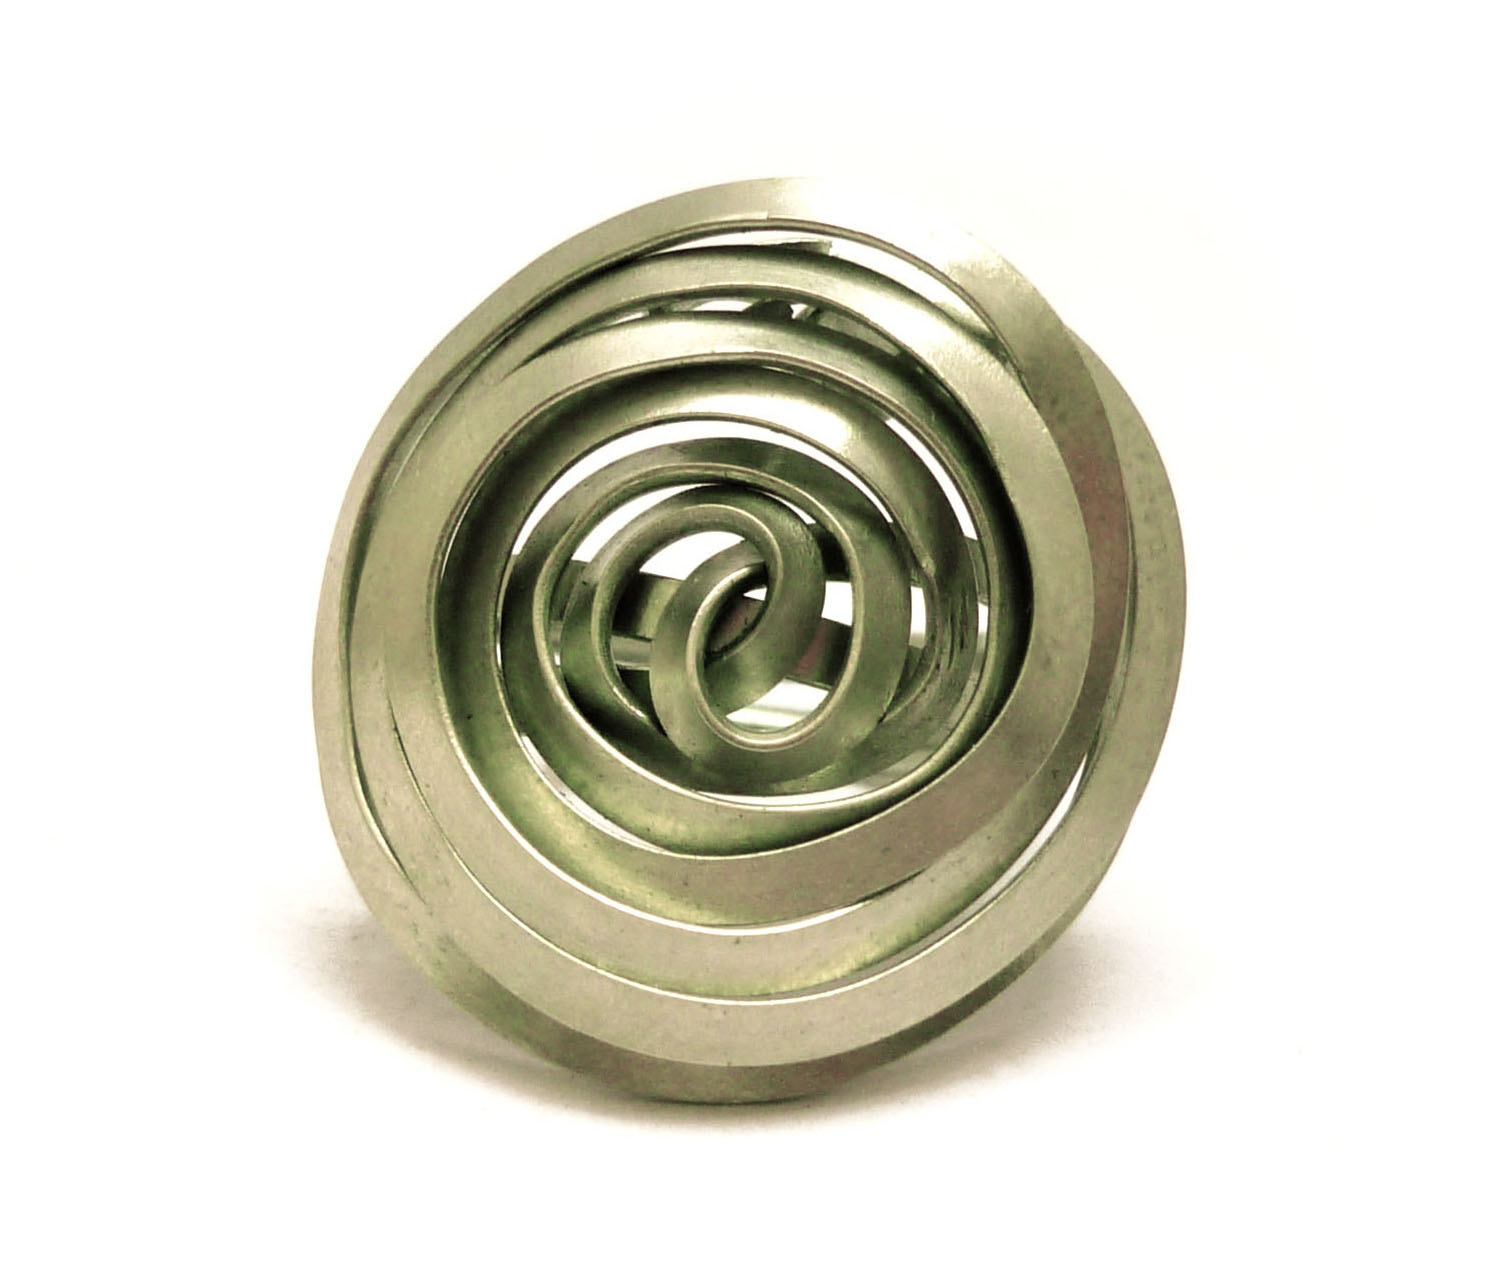 Metal Wire Spiral Center Hsh Wiring Mod To Hh Sss Alloutputcom Wrap Ring By Hyppiechic On Deviantart Rh Com